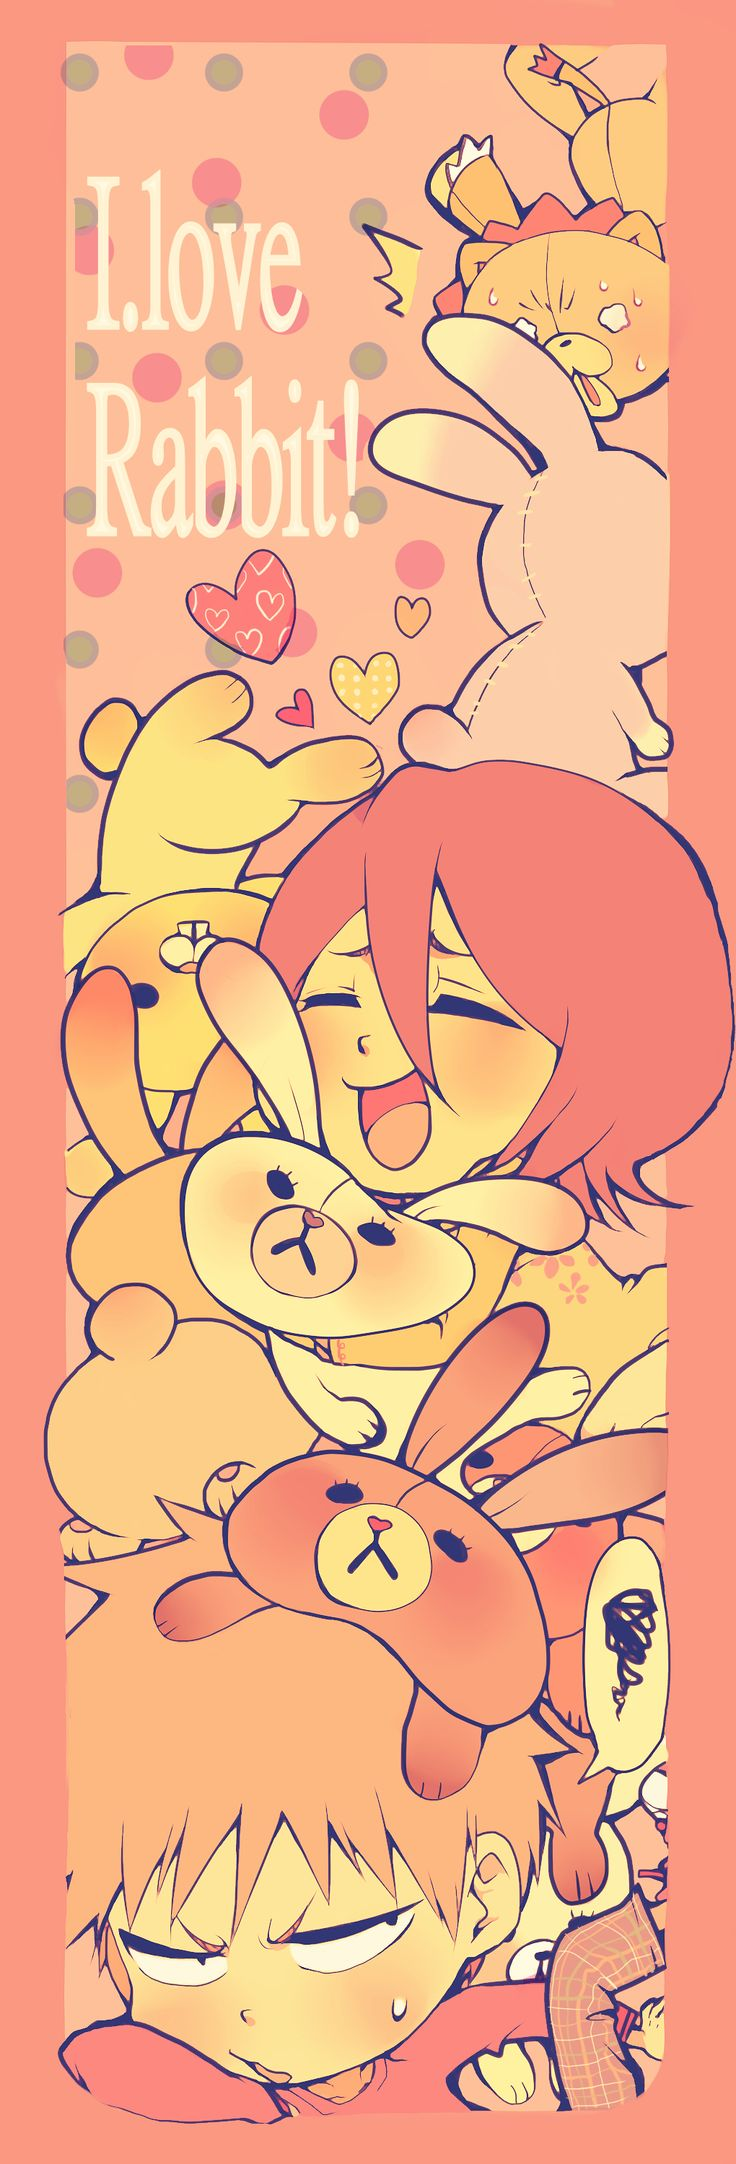 BLEACH | anime | fanart | ichigo kurosaki, rukia kuchiki, kon